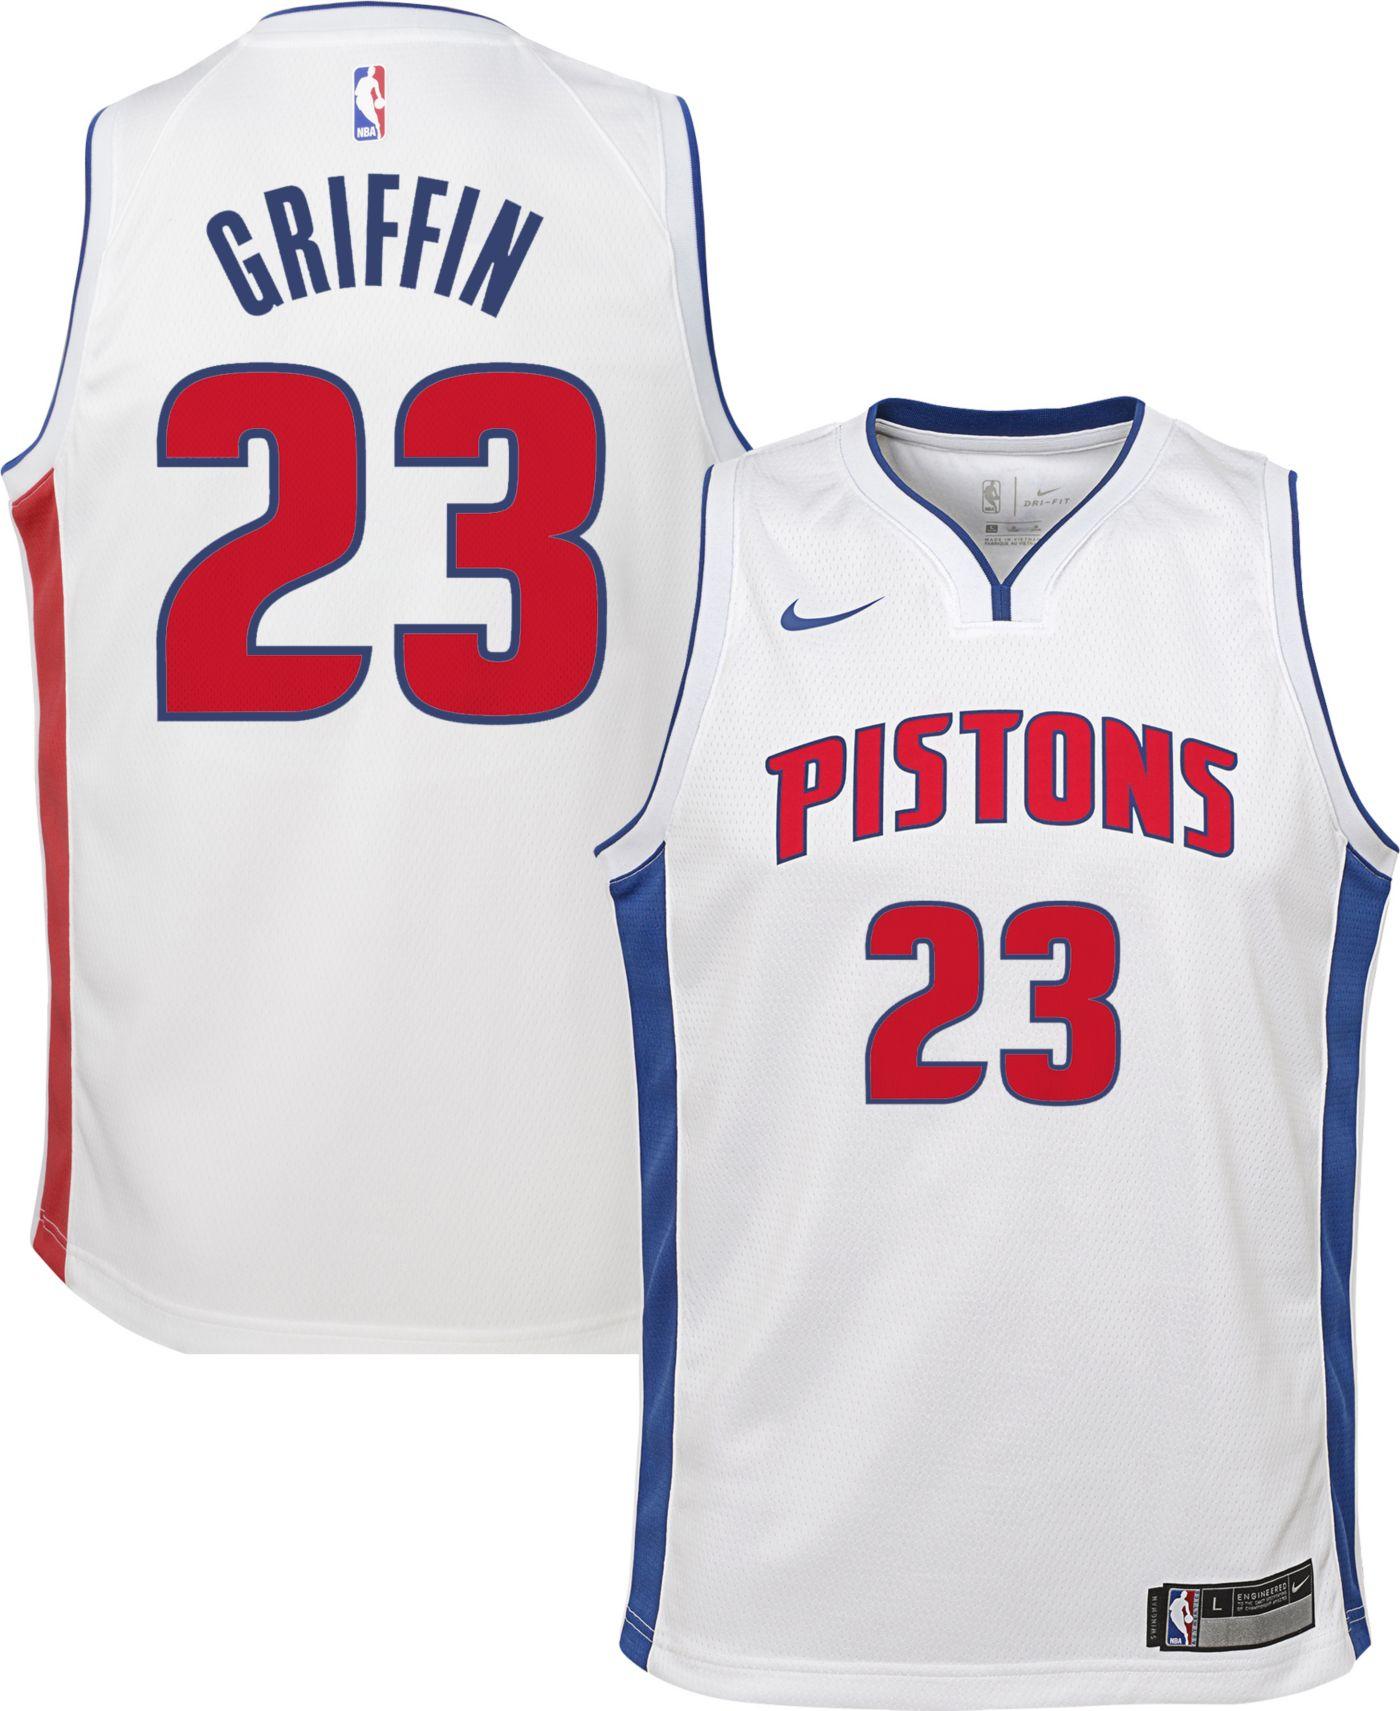 Nike Youth Detroit Pistons Blake Griffin #23 White Dri-FIT Swingman Jersey